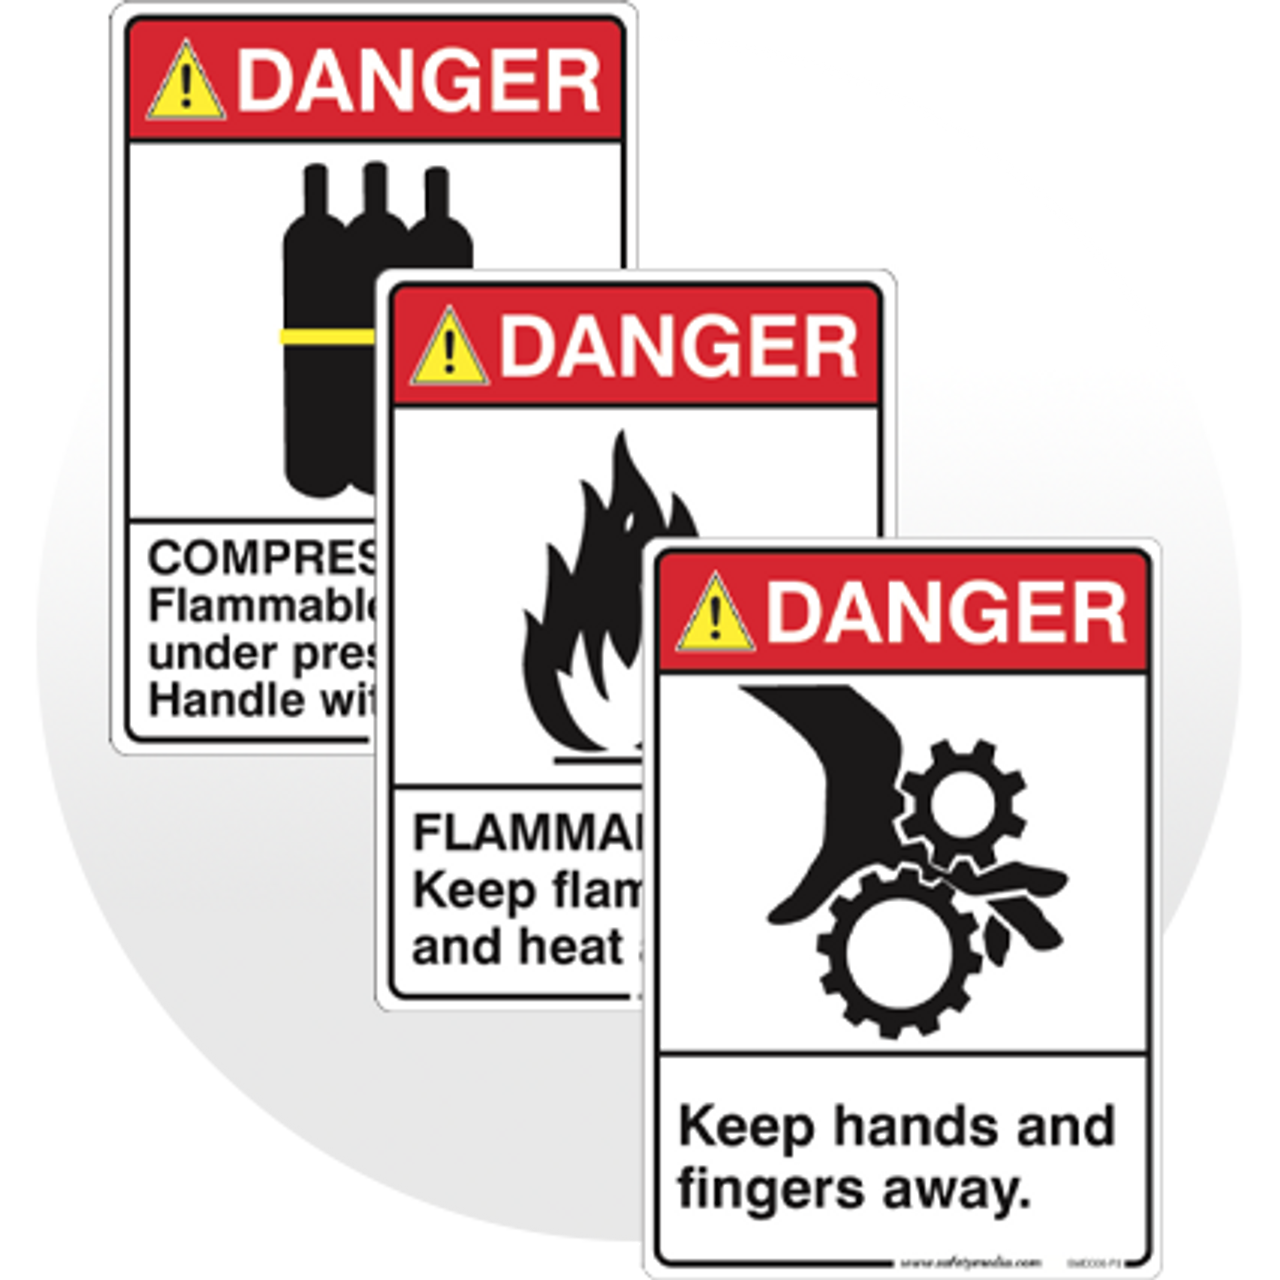 DANGER Safety Signs, ANSI